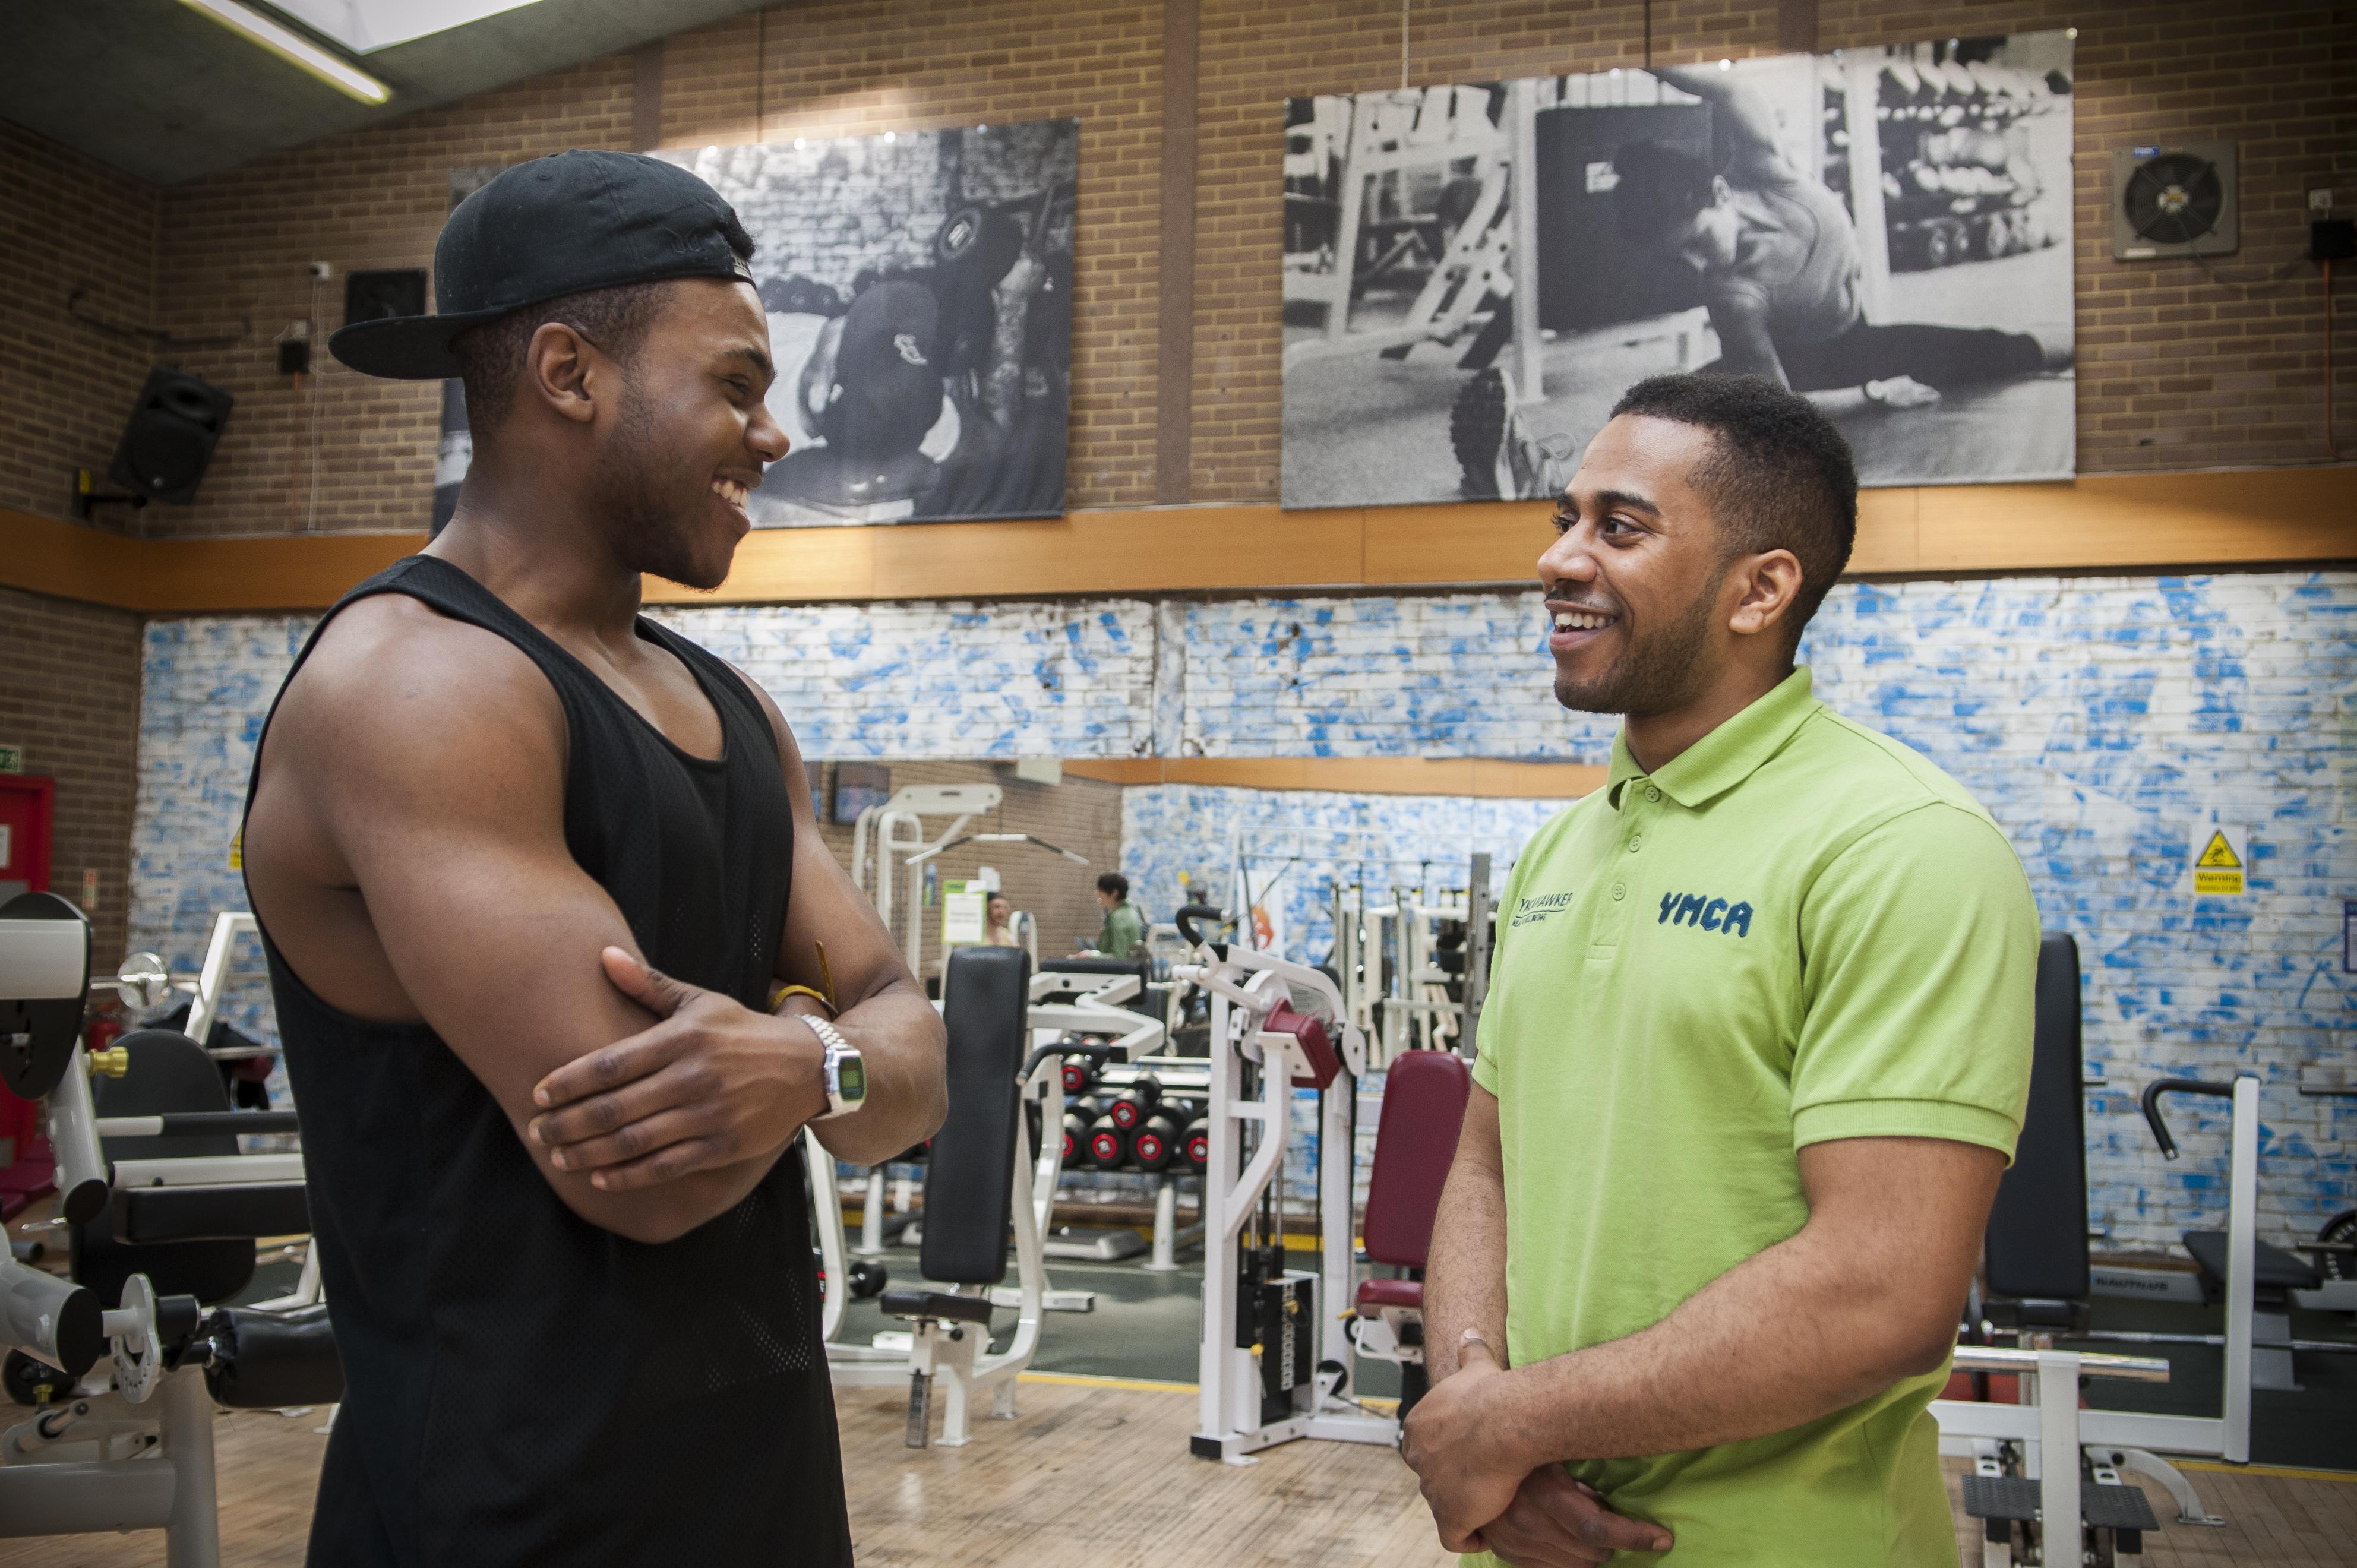 YMCA Wimbledon Kingston RB 16 361 of 799 Copy - Gym & exercise classes at YMCA Wimbledon